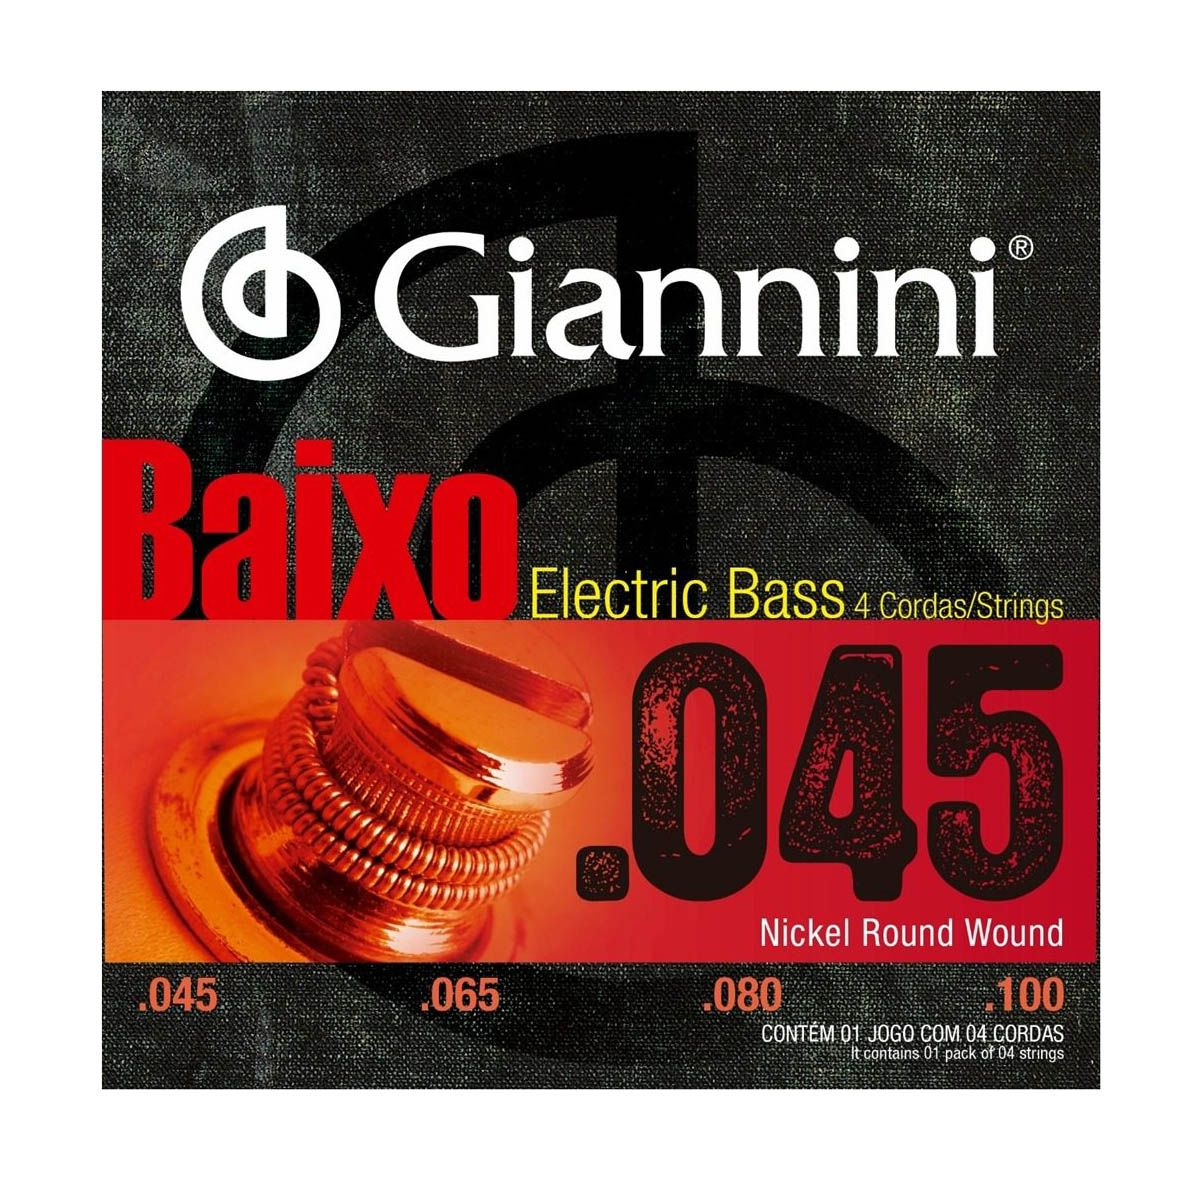 Encordoamento Giannini GEEBRS-4 .045/.100 para Contrabaixo